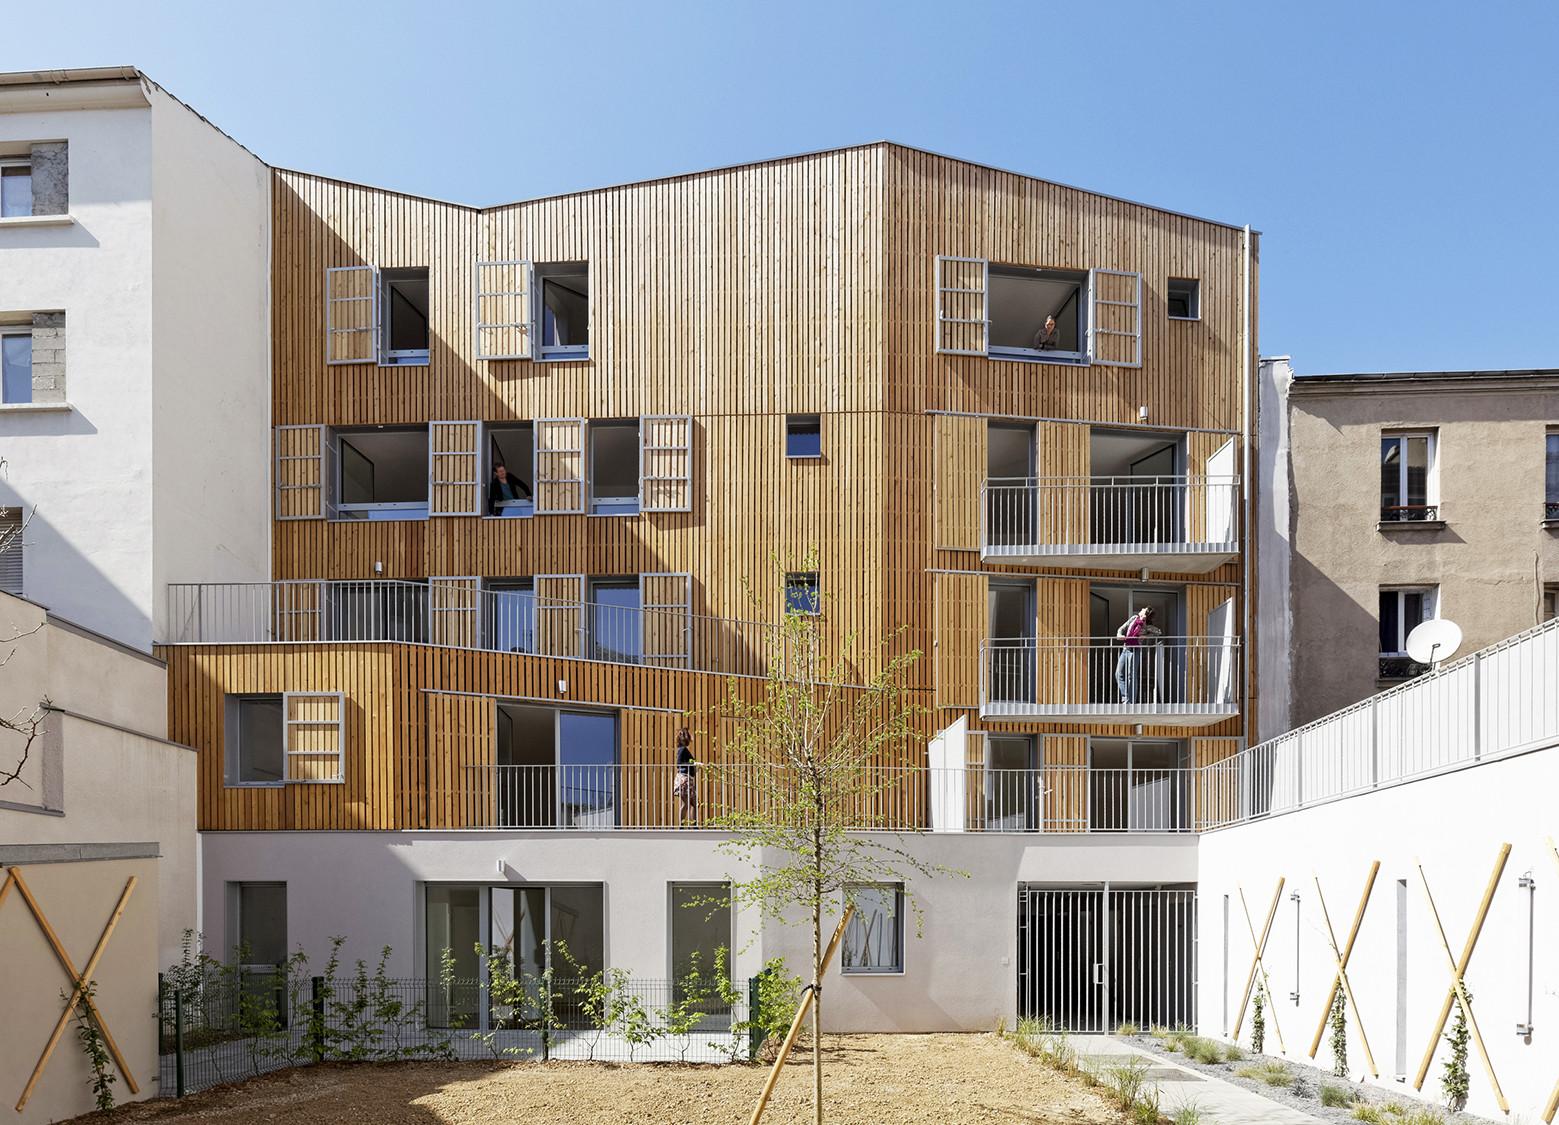 8 Housing in Patin / Benjamin Fleury, © David Boureau